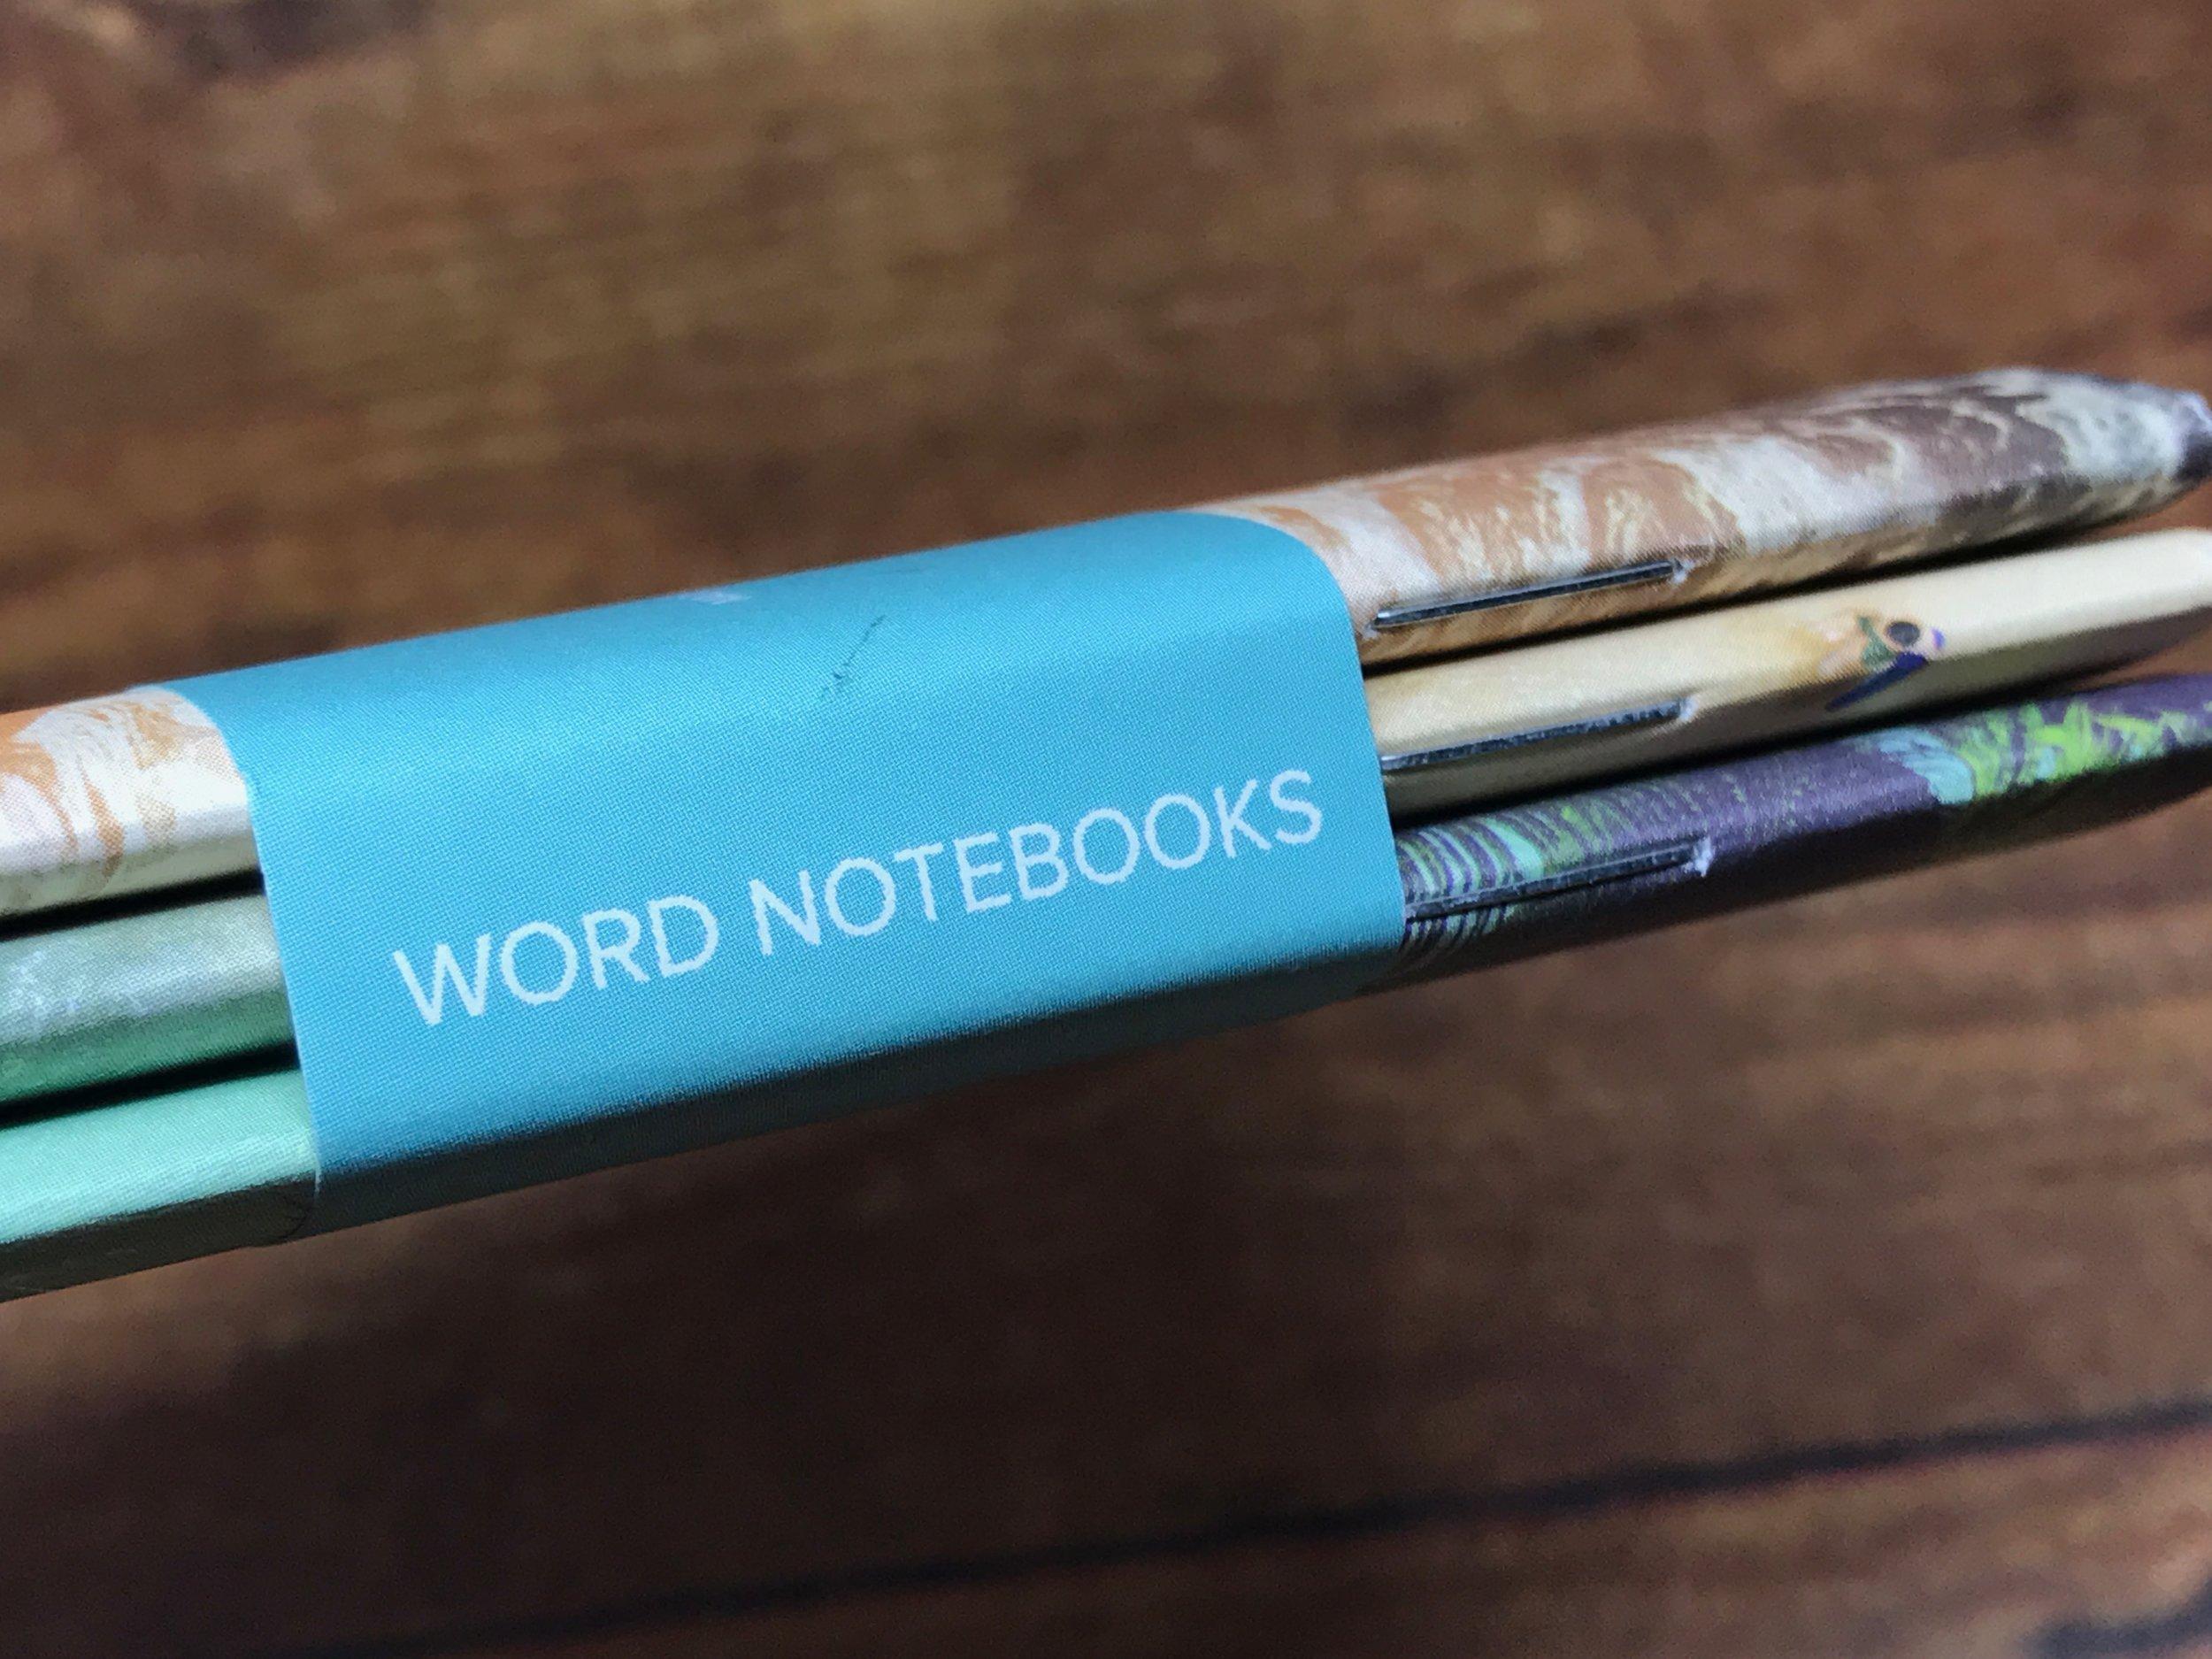 word-notebooks-beach-vibes-22.jpg